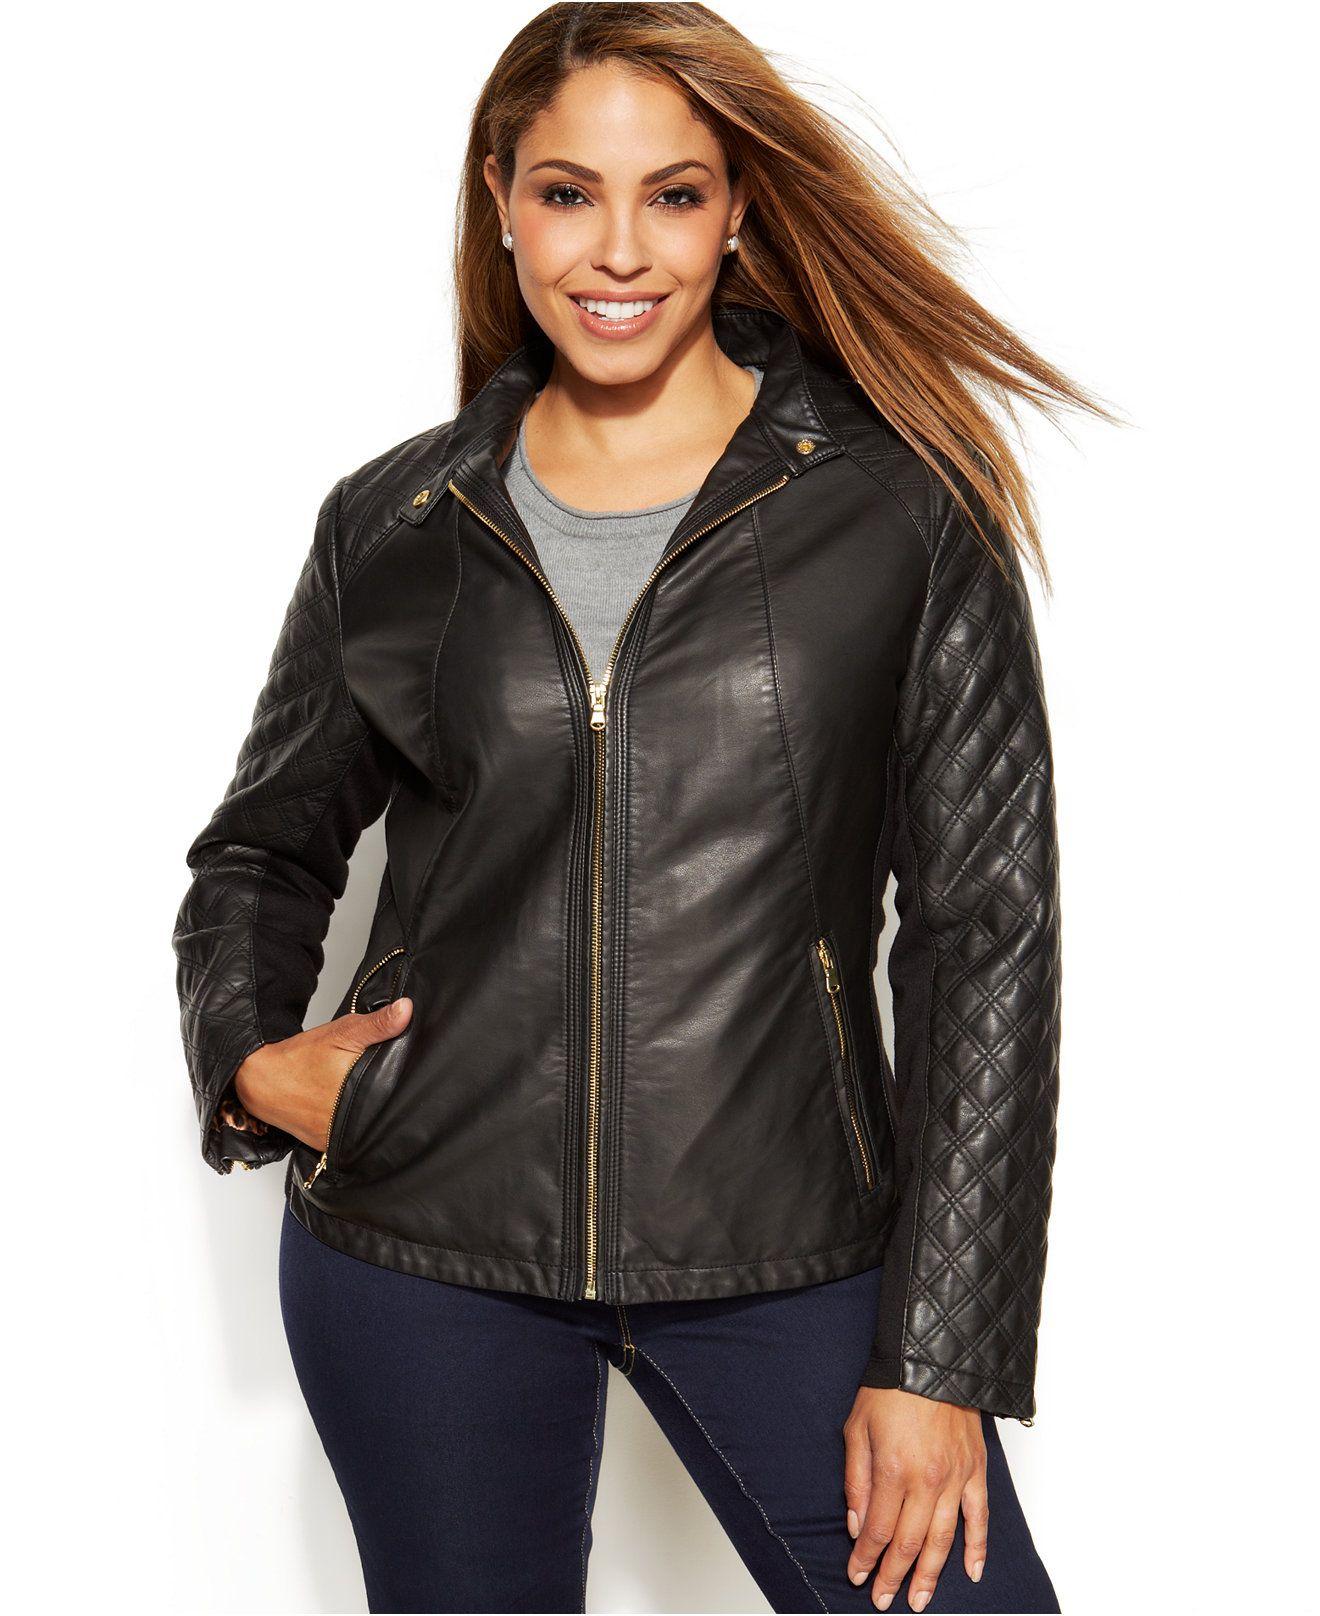 Inc International Concepts Plus Size Quilted Faux Leather Moto Jacket Coats Women Macy S Faux Leather Moto Jacket Coats For Women Jackets [ 1616 x 1320 Pixel ]